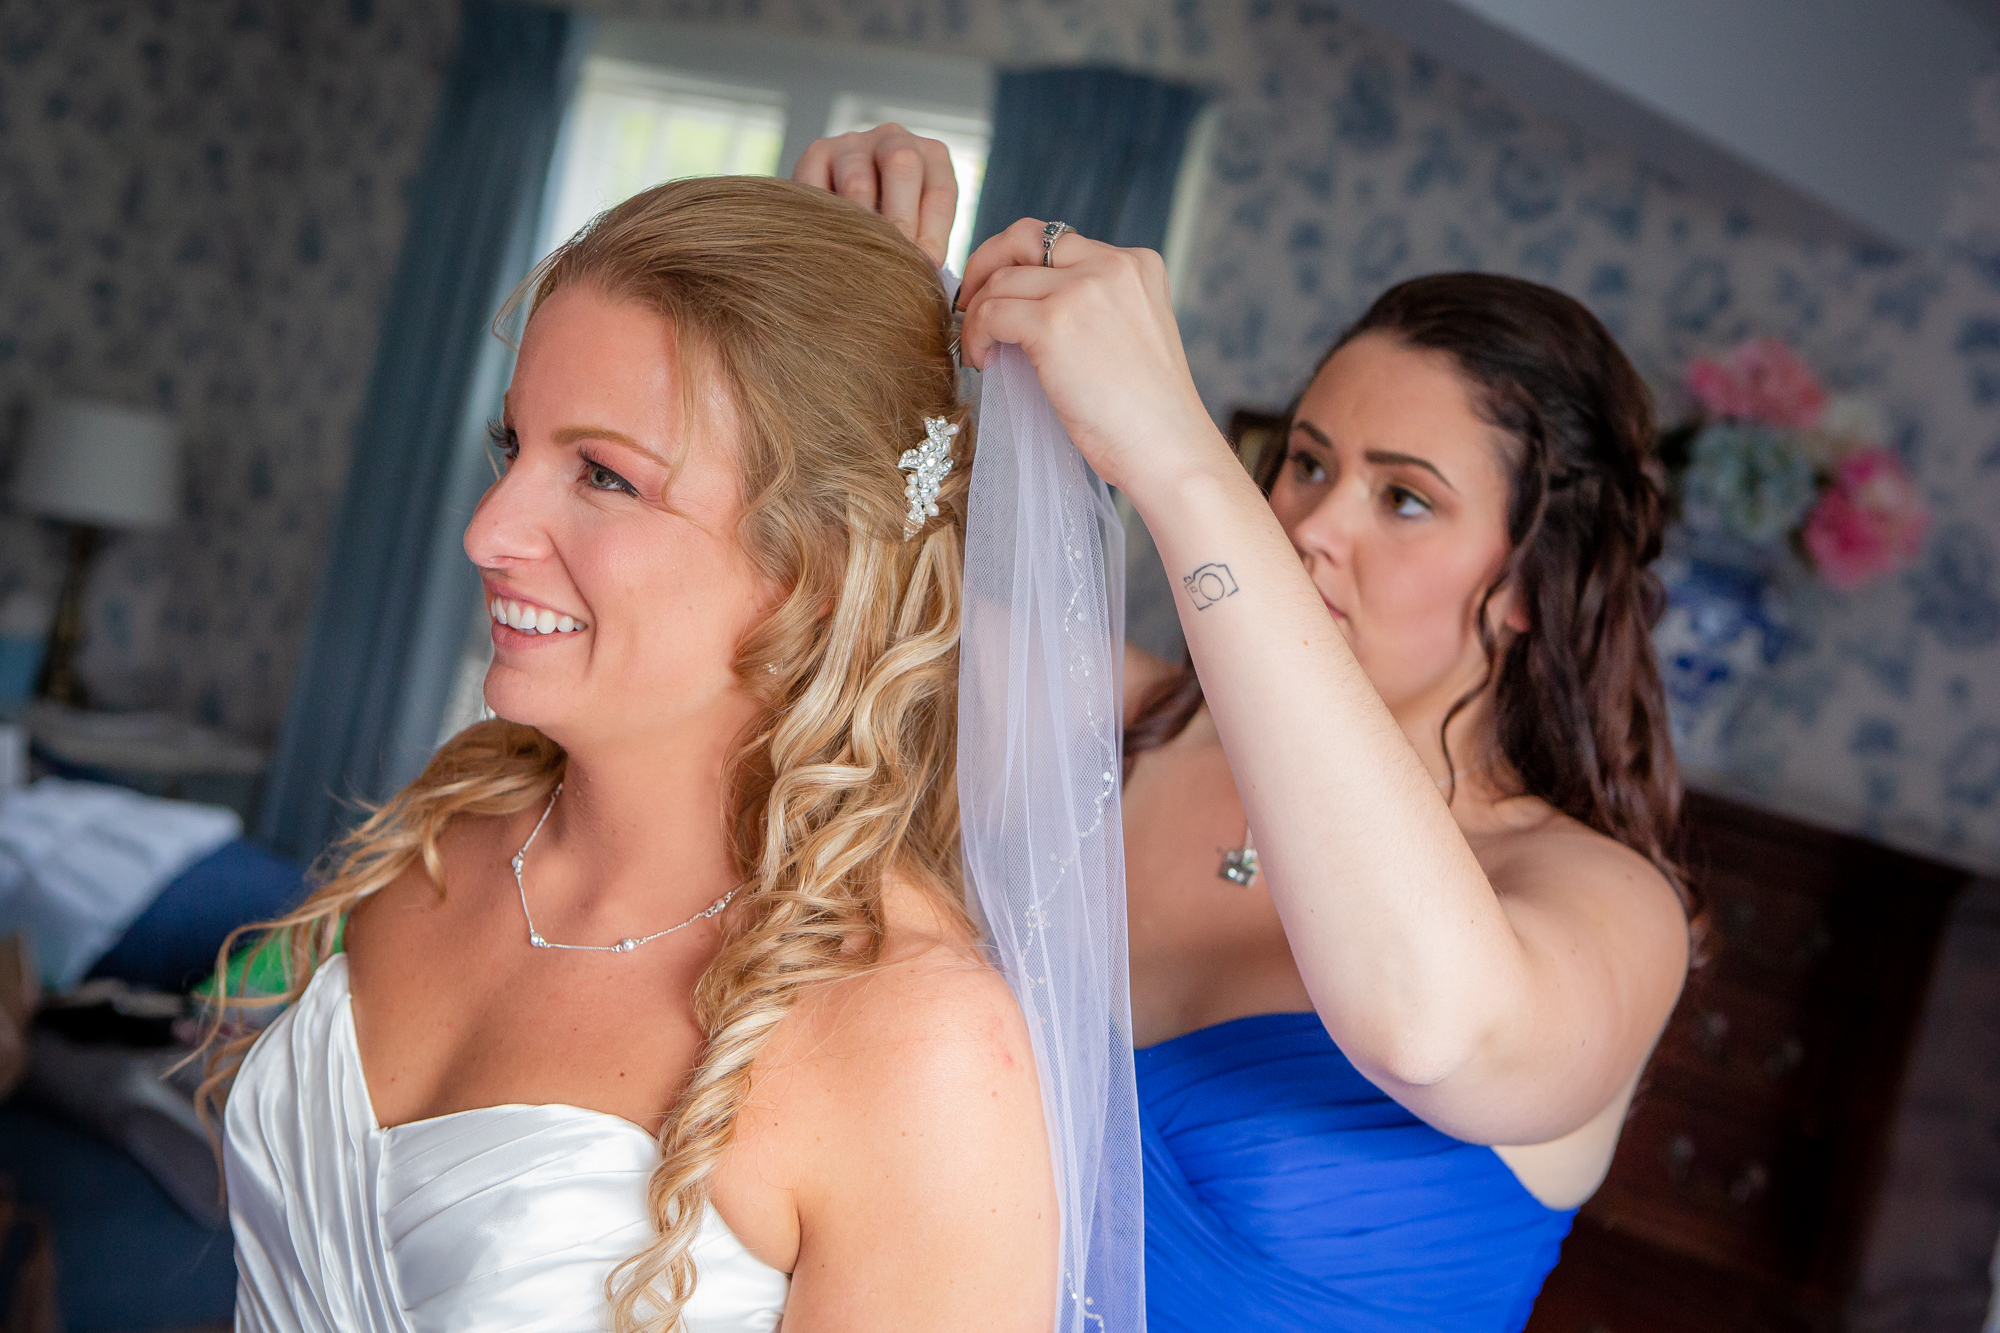 Raddison-Hotel-Corning-NY-Wedding-3669.jpg